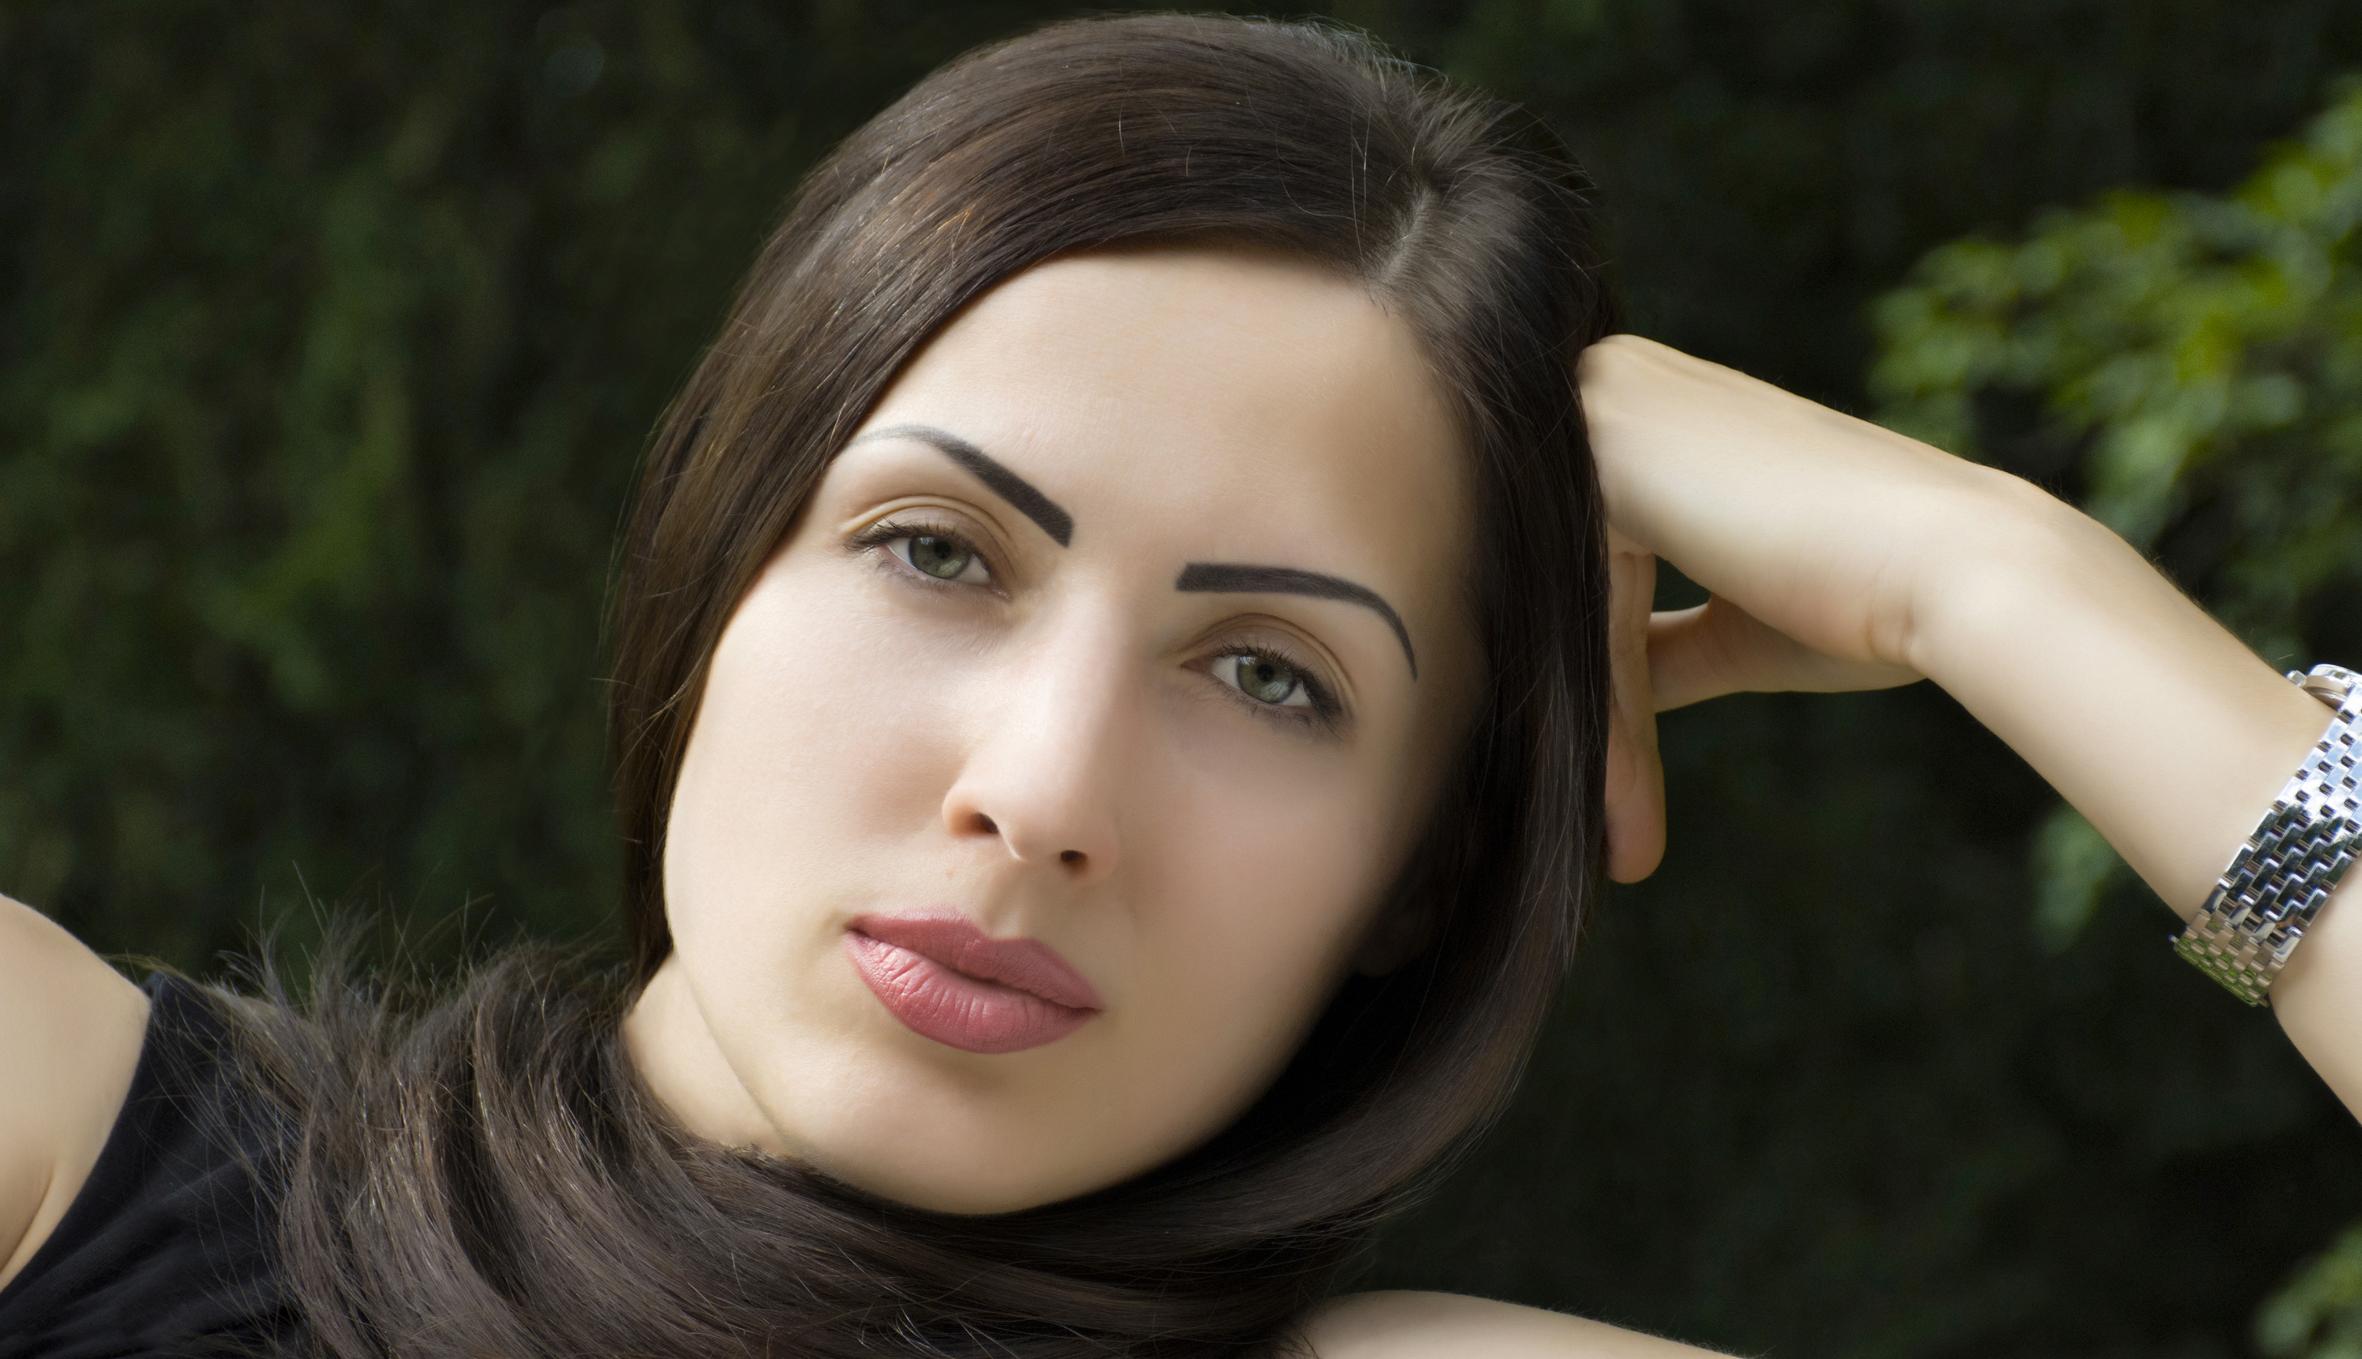 elena-bohland-2